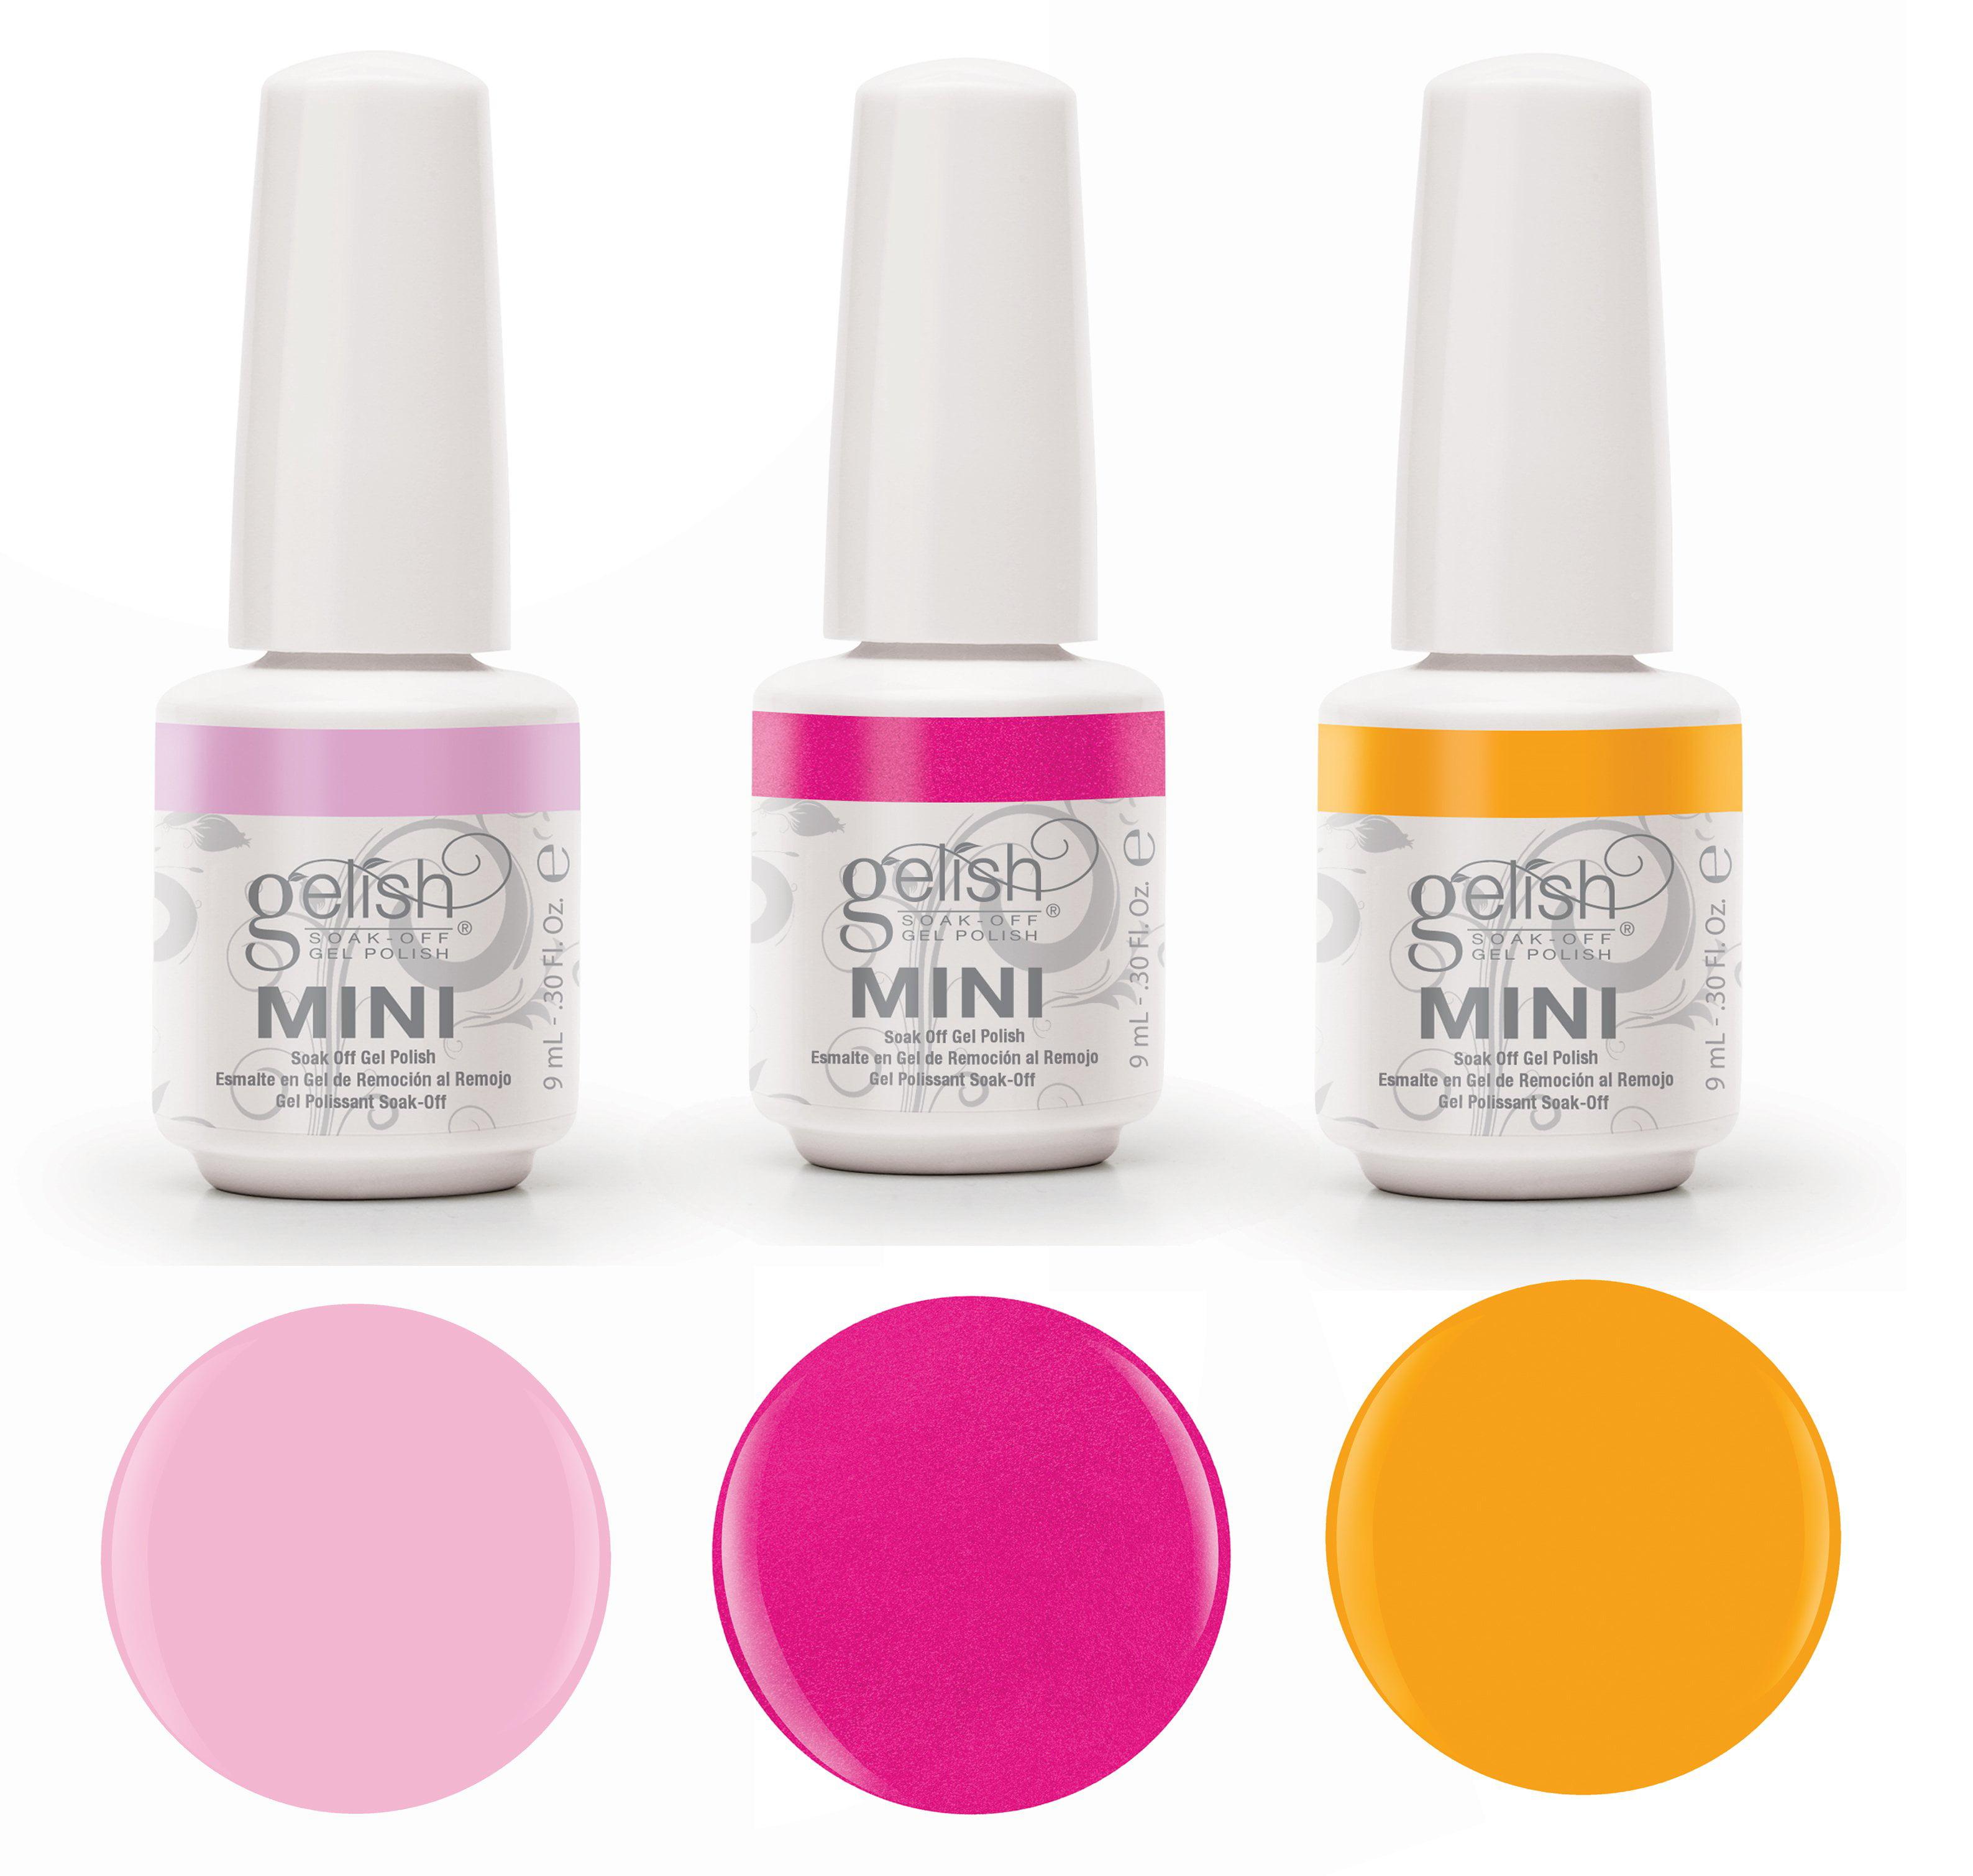 Gelish Neon Street Beat 3 Color Gel Nail Polish Kit -  Includes 3 9mL Bottles